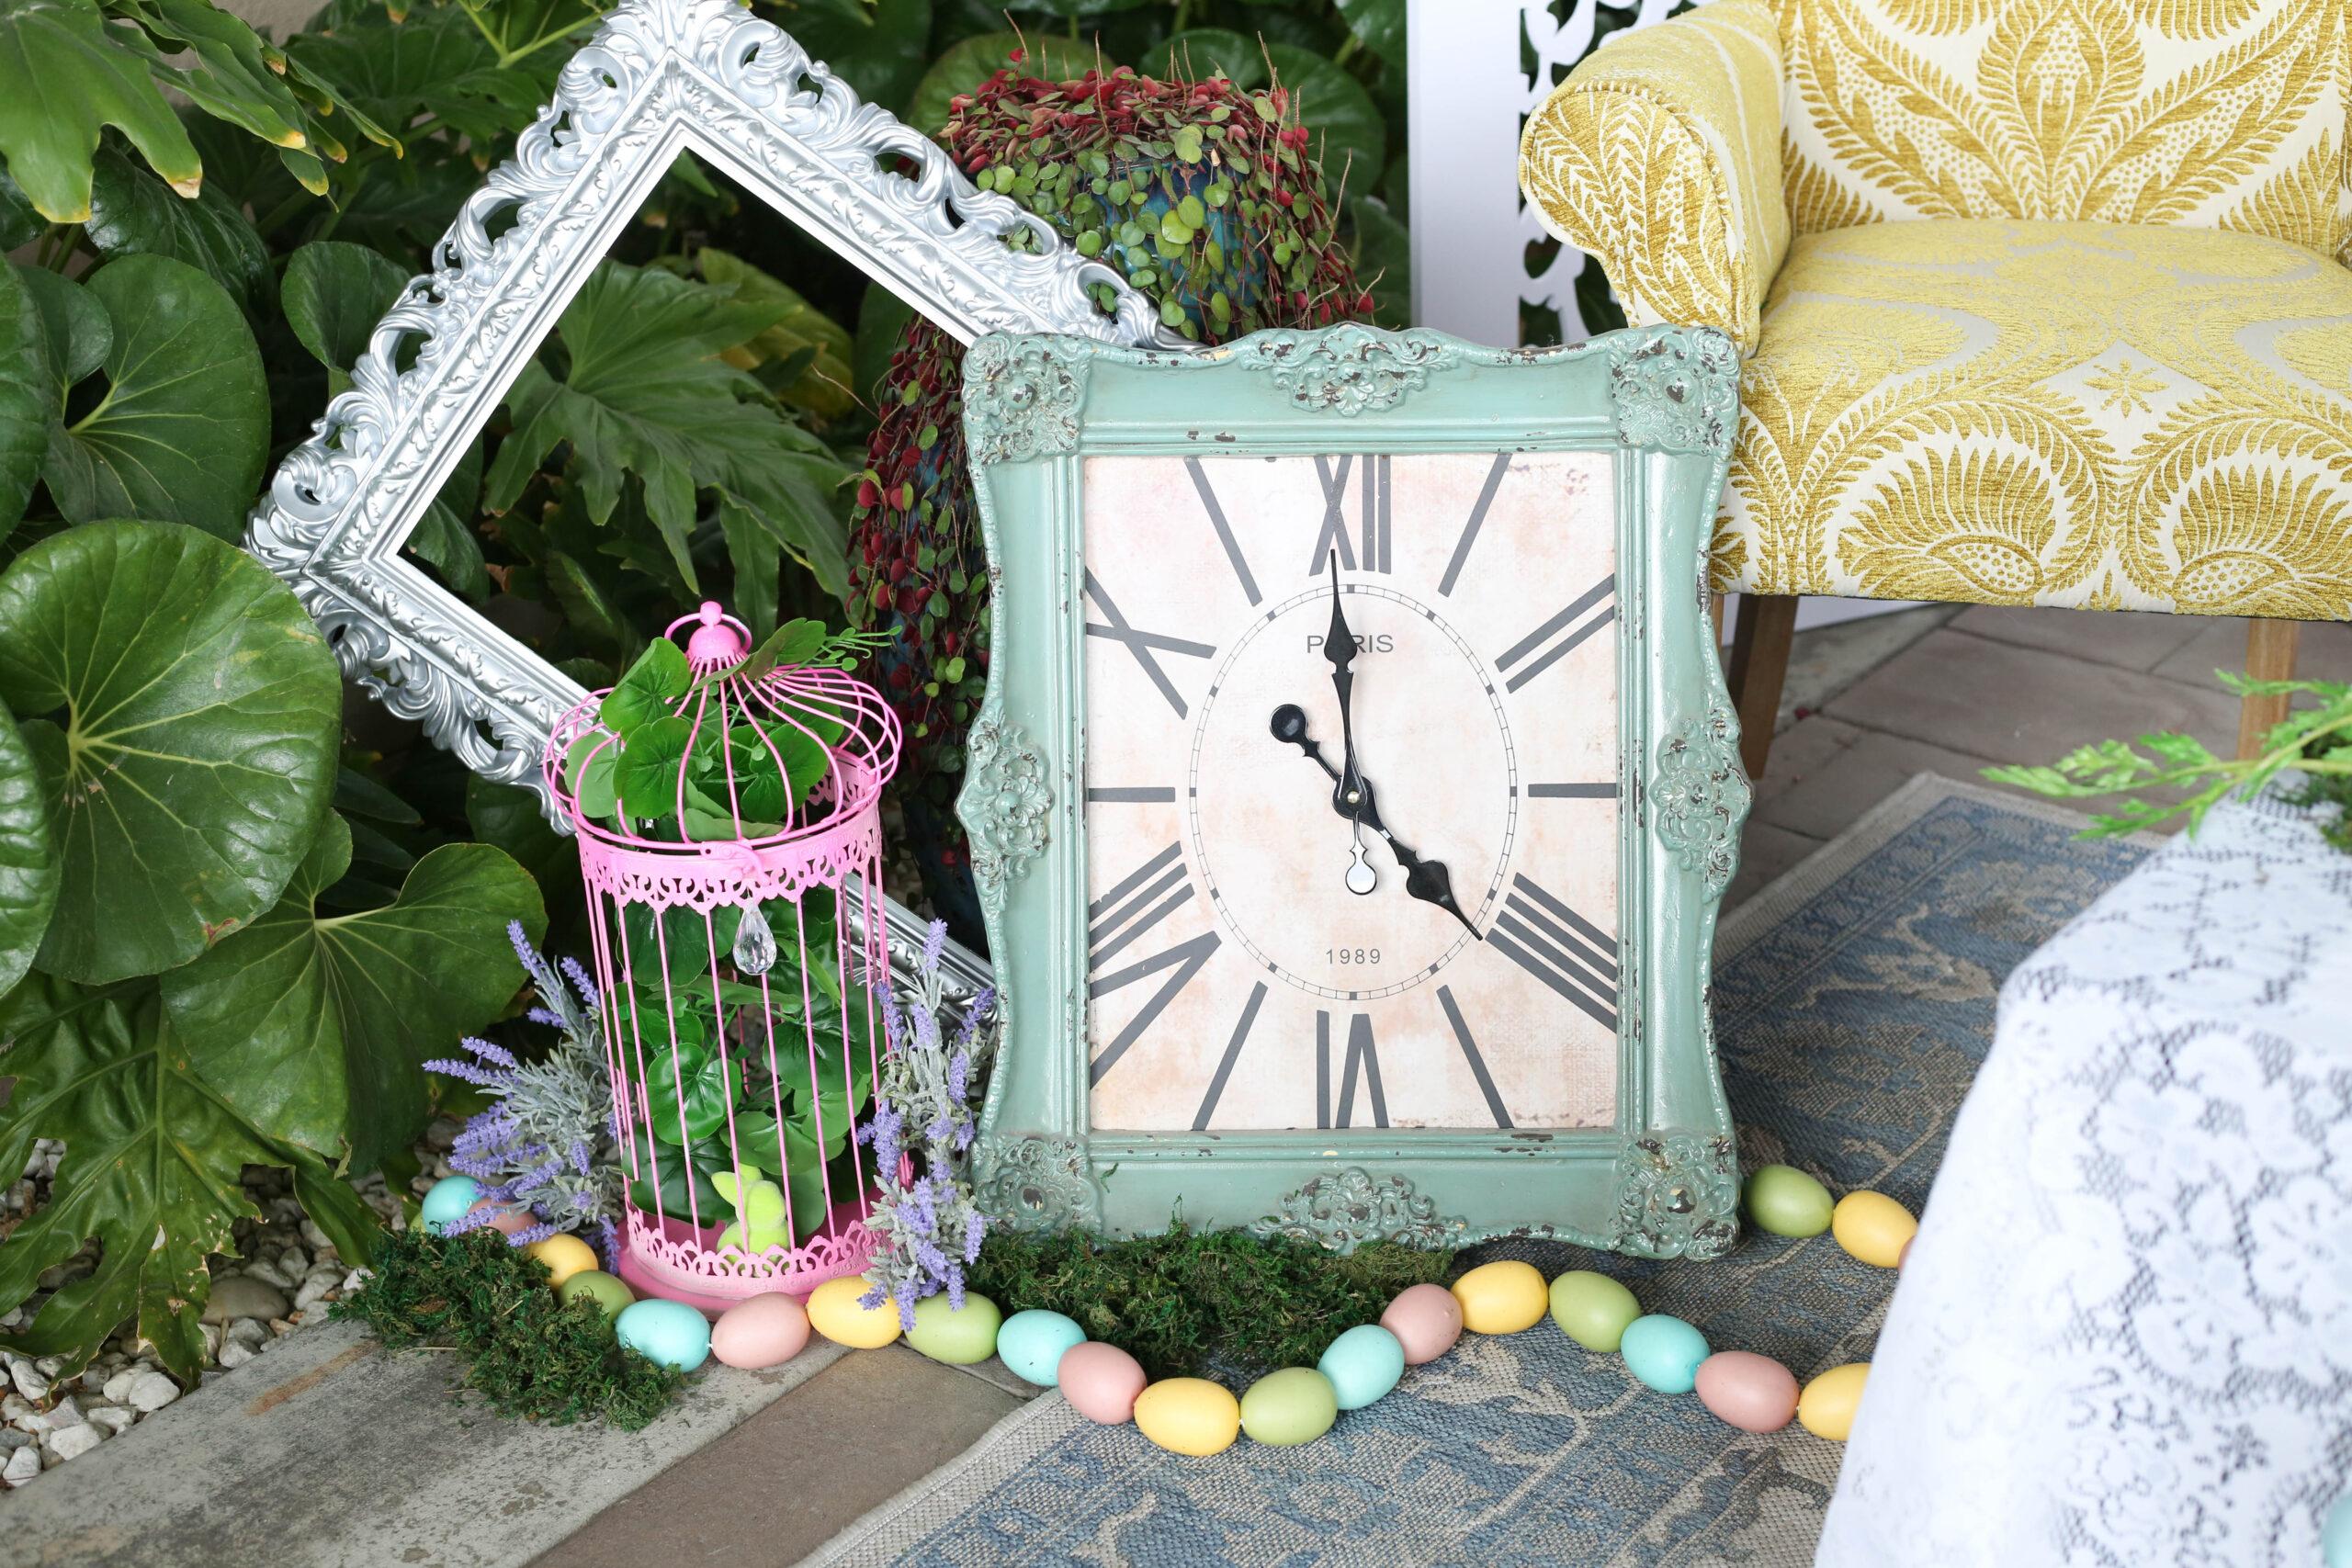 ornate frames and clocks